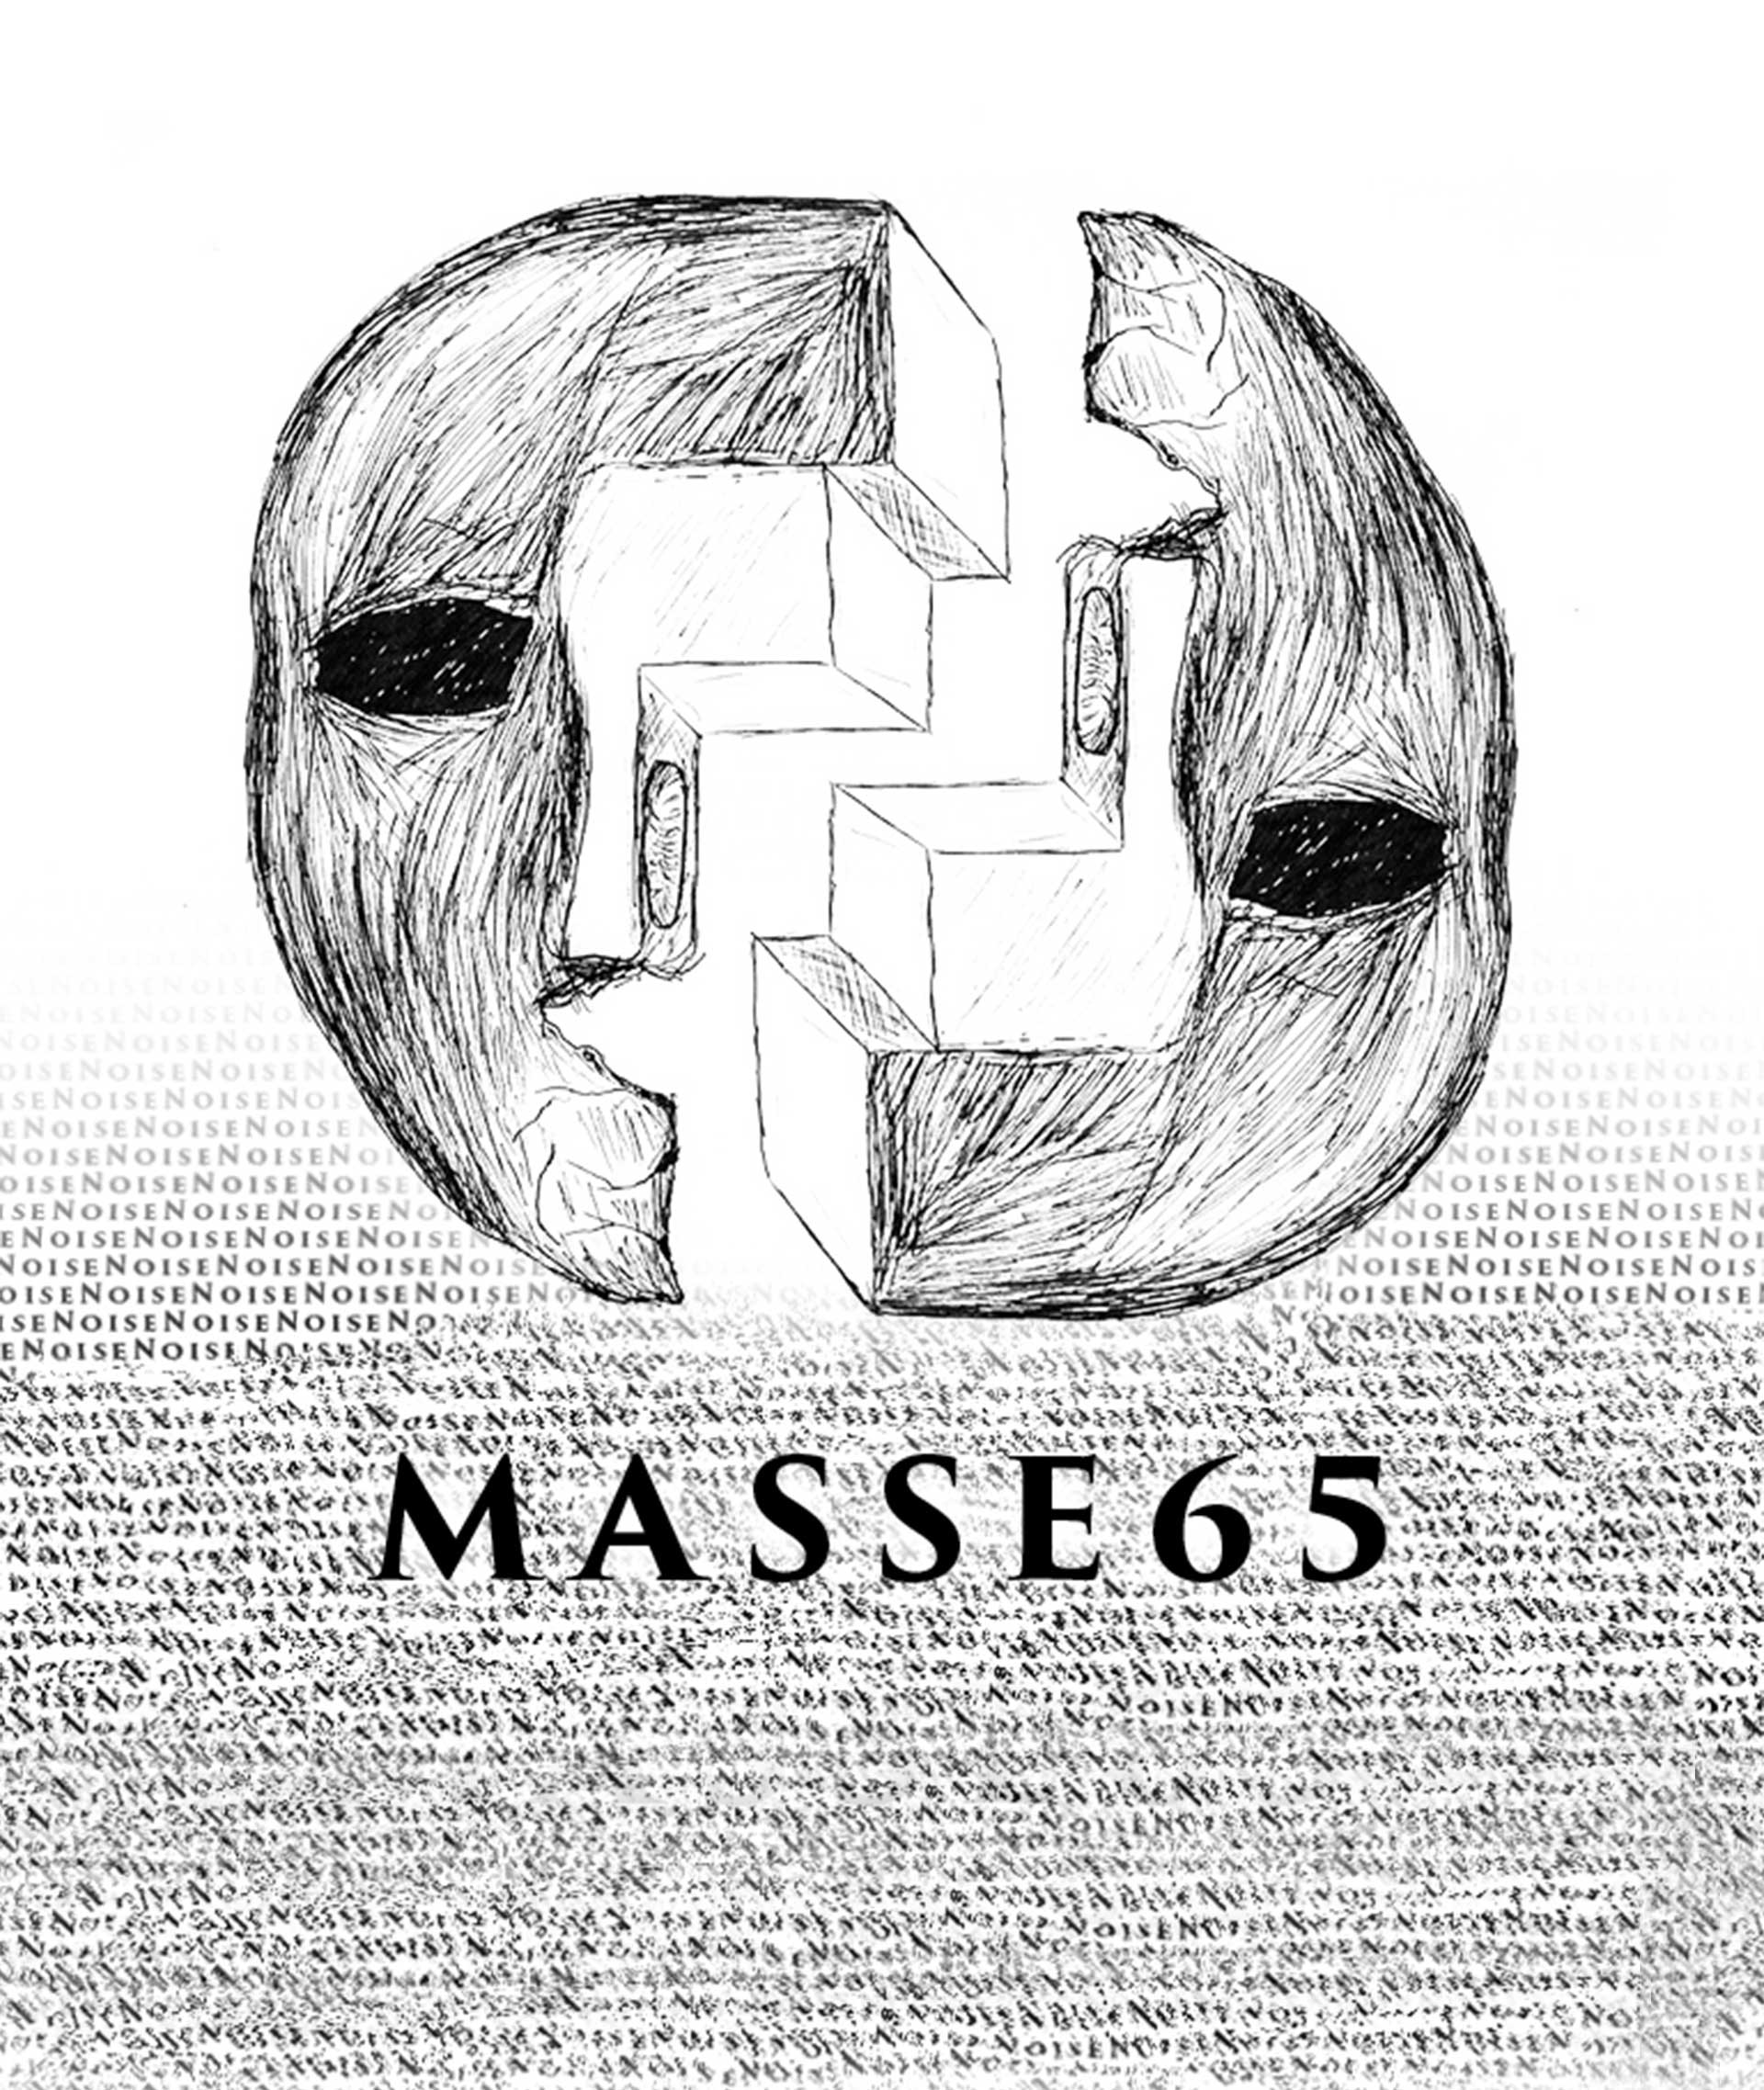 Masse 65